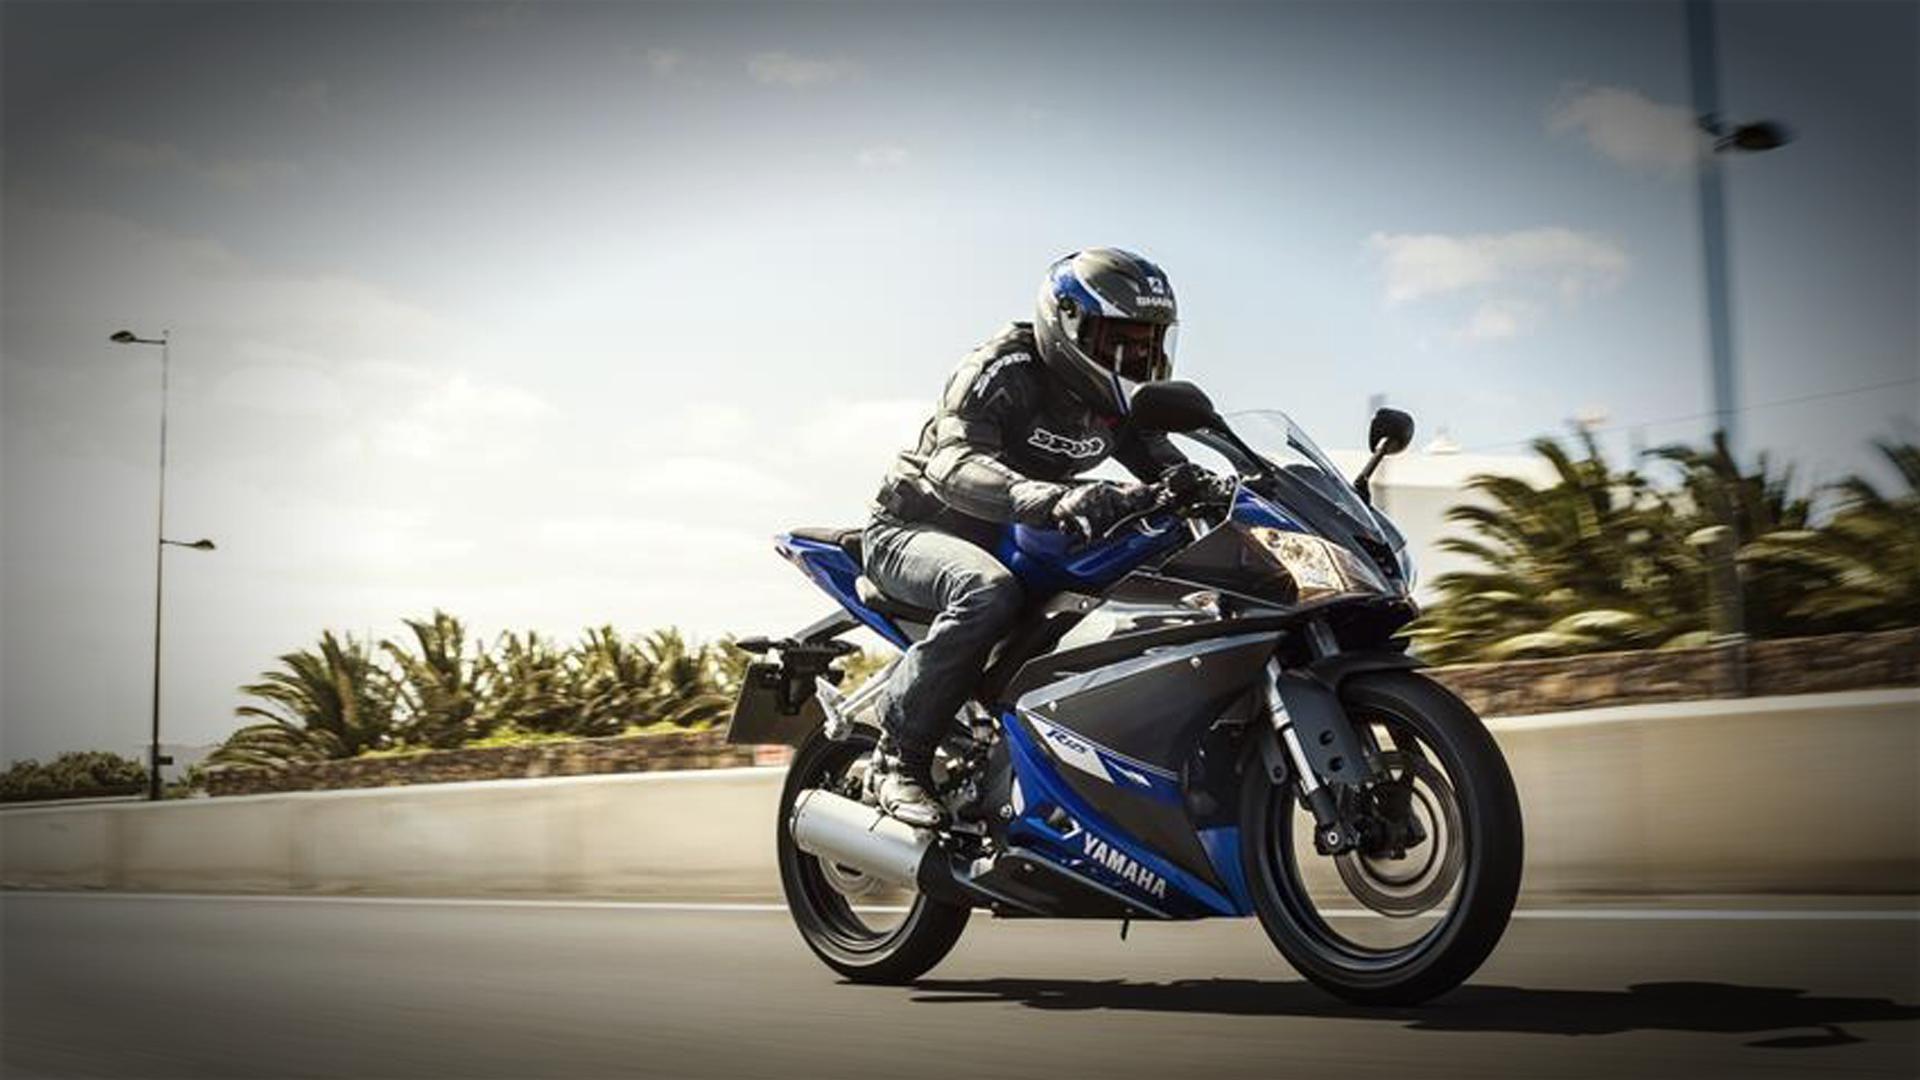 Yamaha yzf r125 usata moto usate 2016 car release date - Yamaha Yzf R125 Black 2014 Yamaha Yzf R125 Liquid Cooled 4 Stroke Single Cylinder Engine